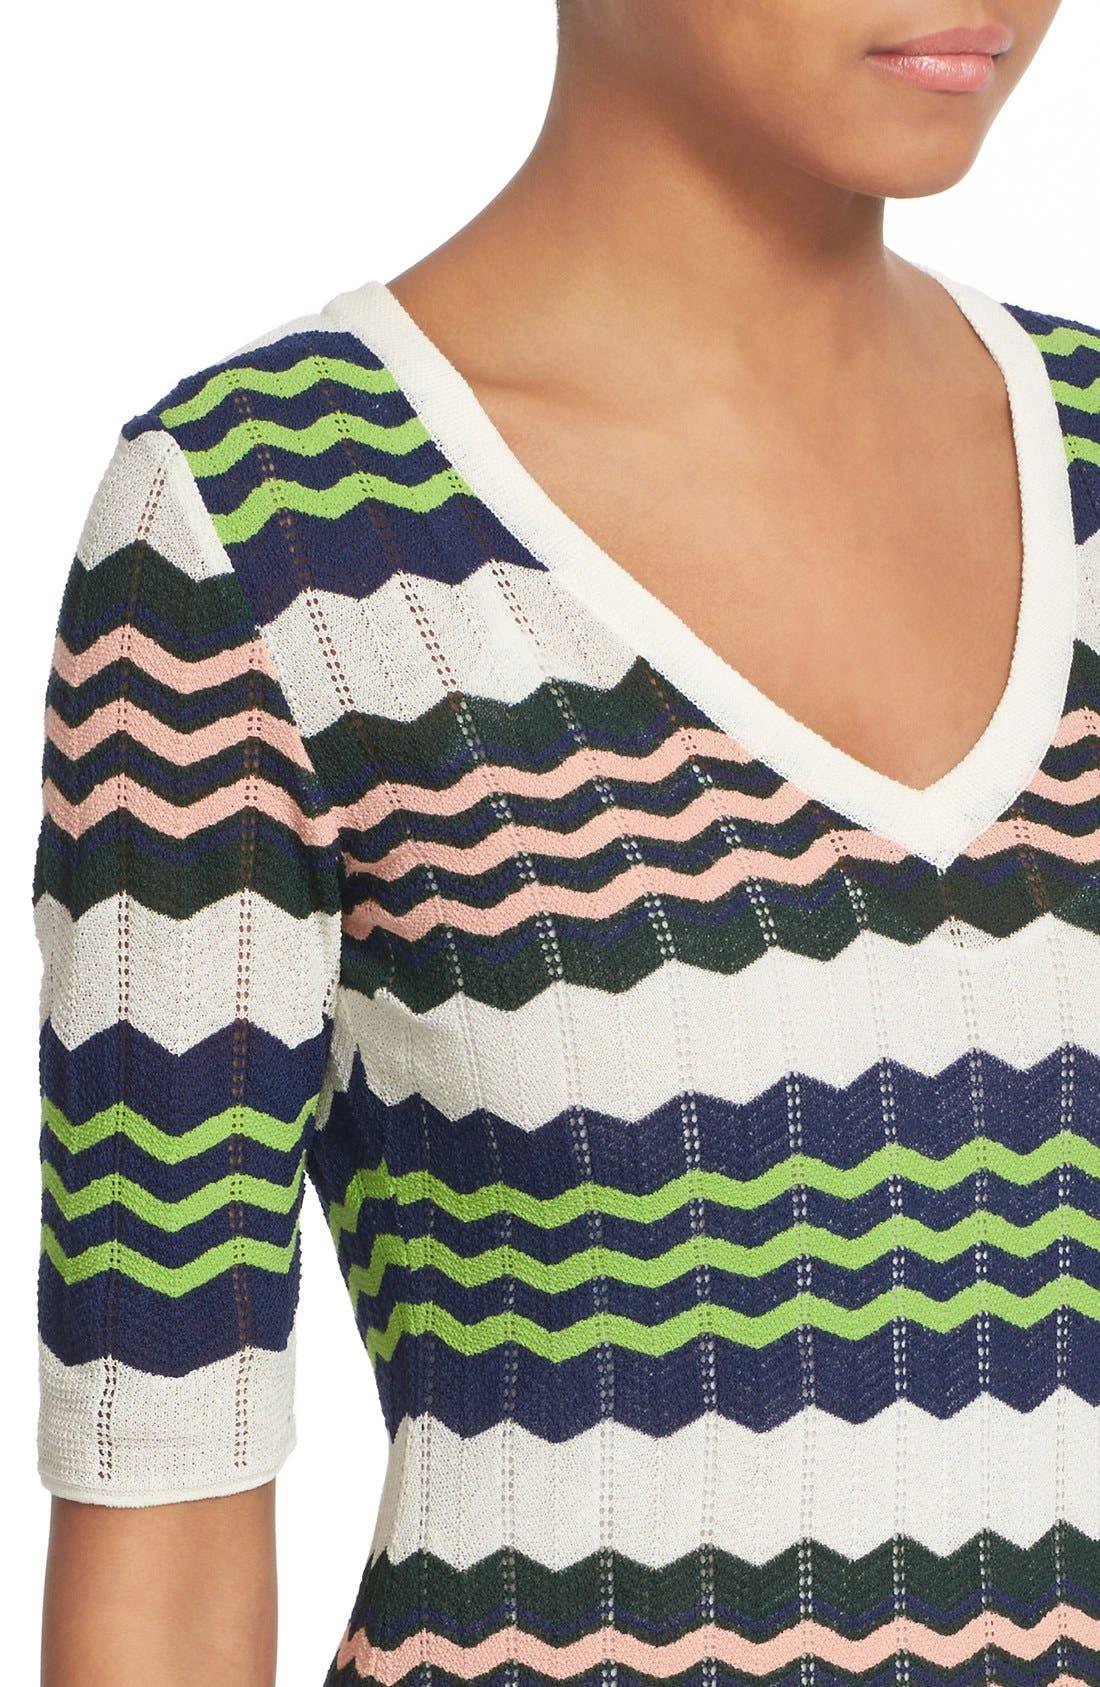 Zigzag Stripe Knit A-Line Dress,                             Alternate thumbnail 4, color,                             900